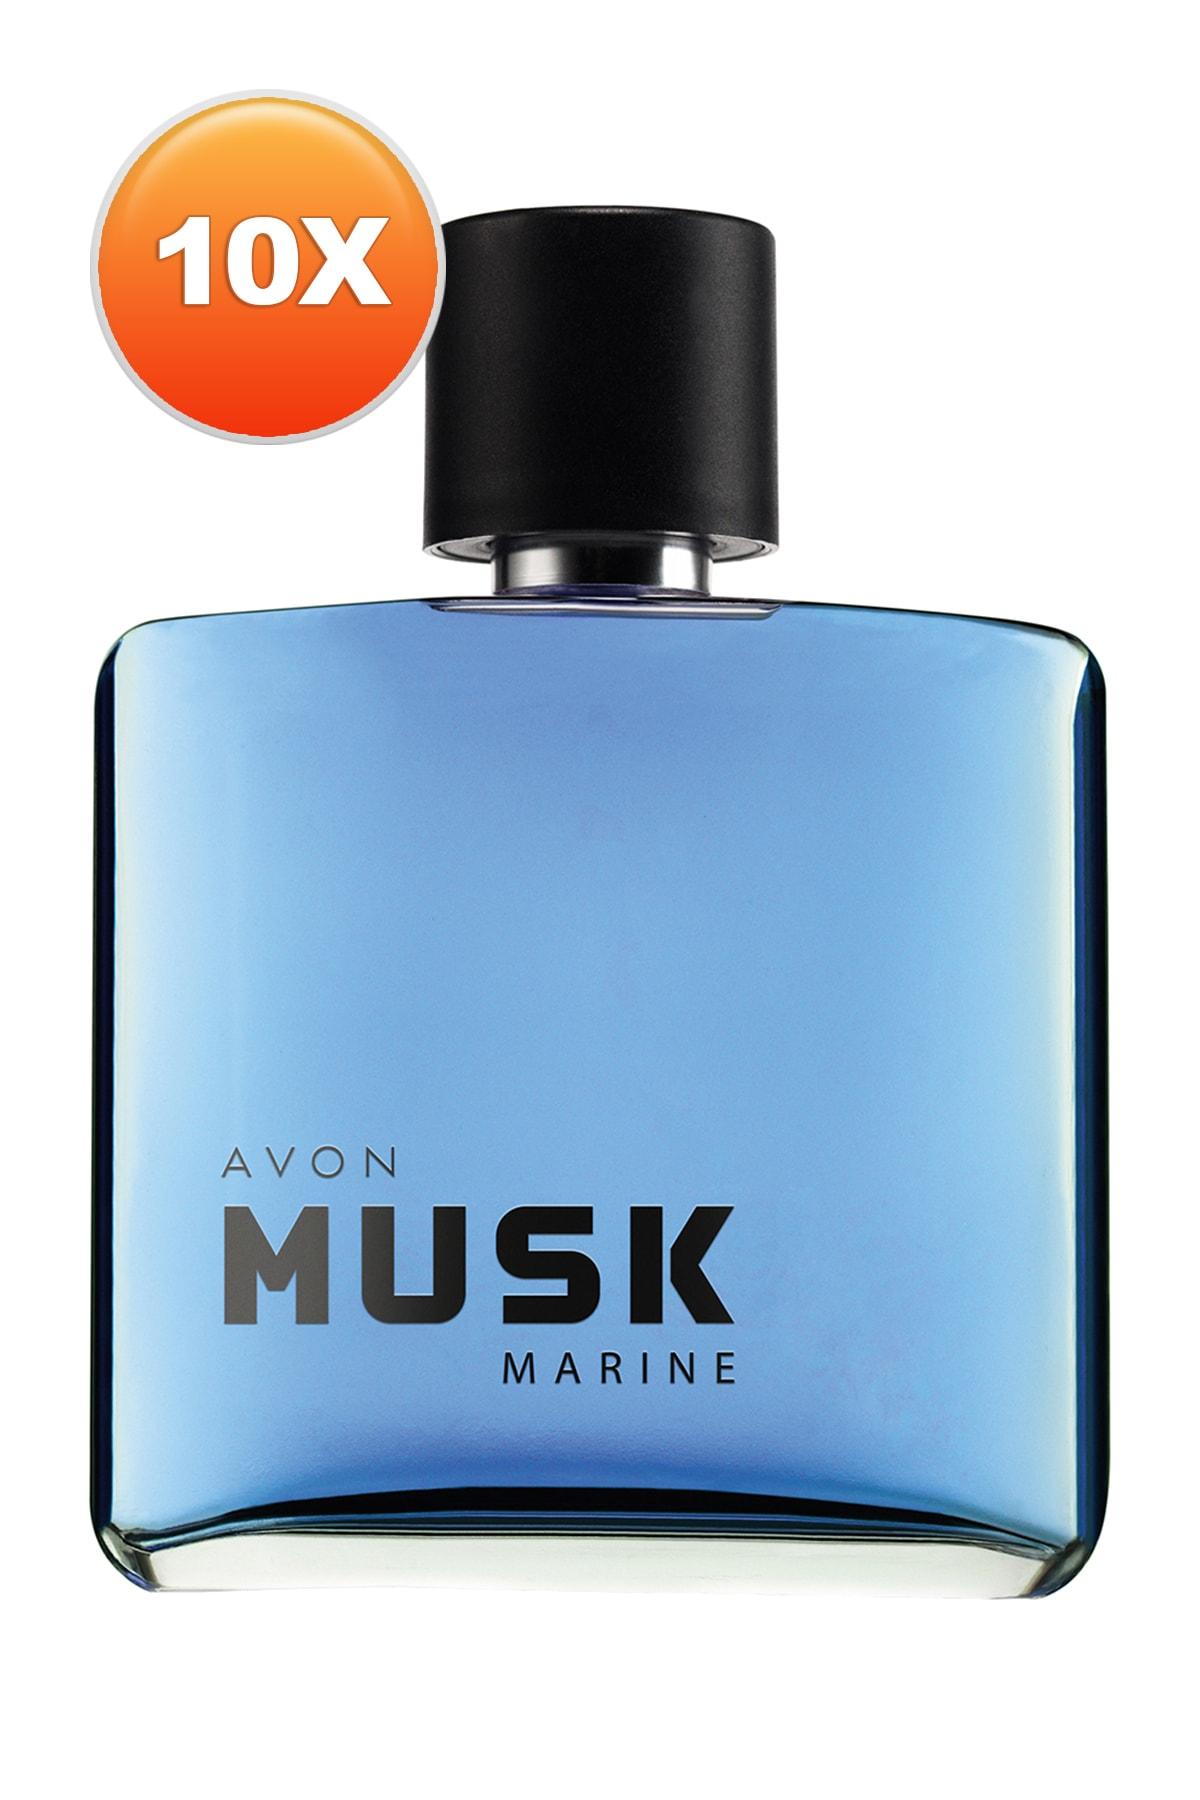 AVON Musk Marine Erkek Parfüm Edt 75 ml 10'lu Set 5050000104883 1